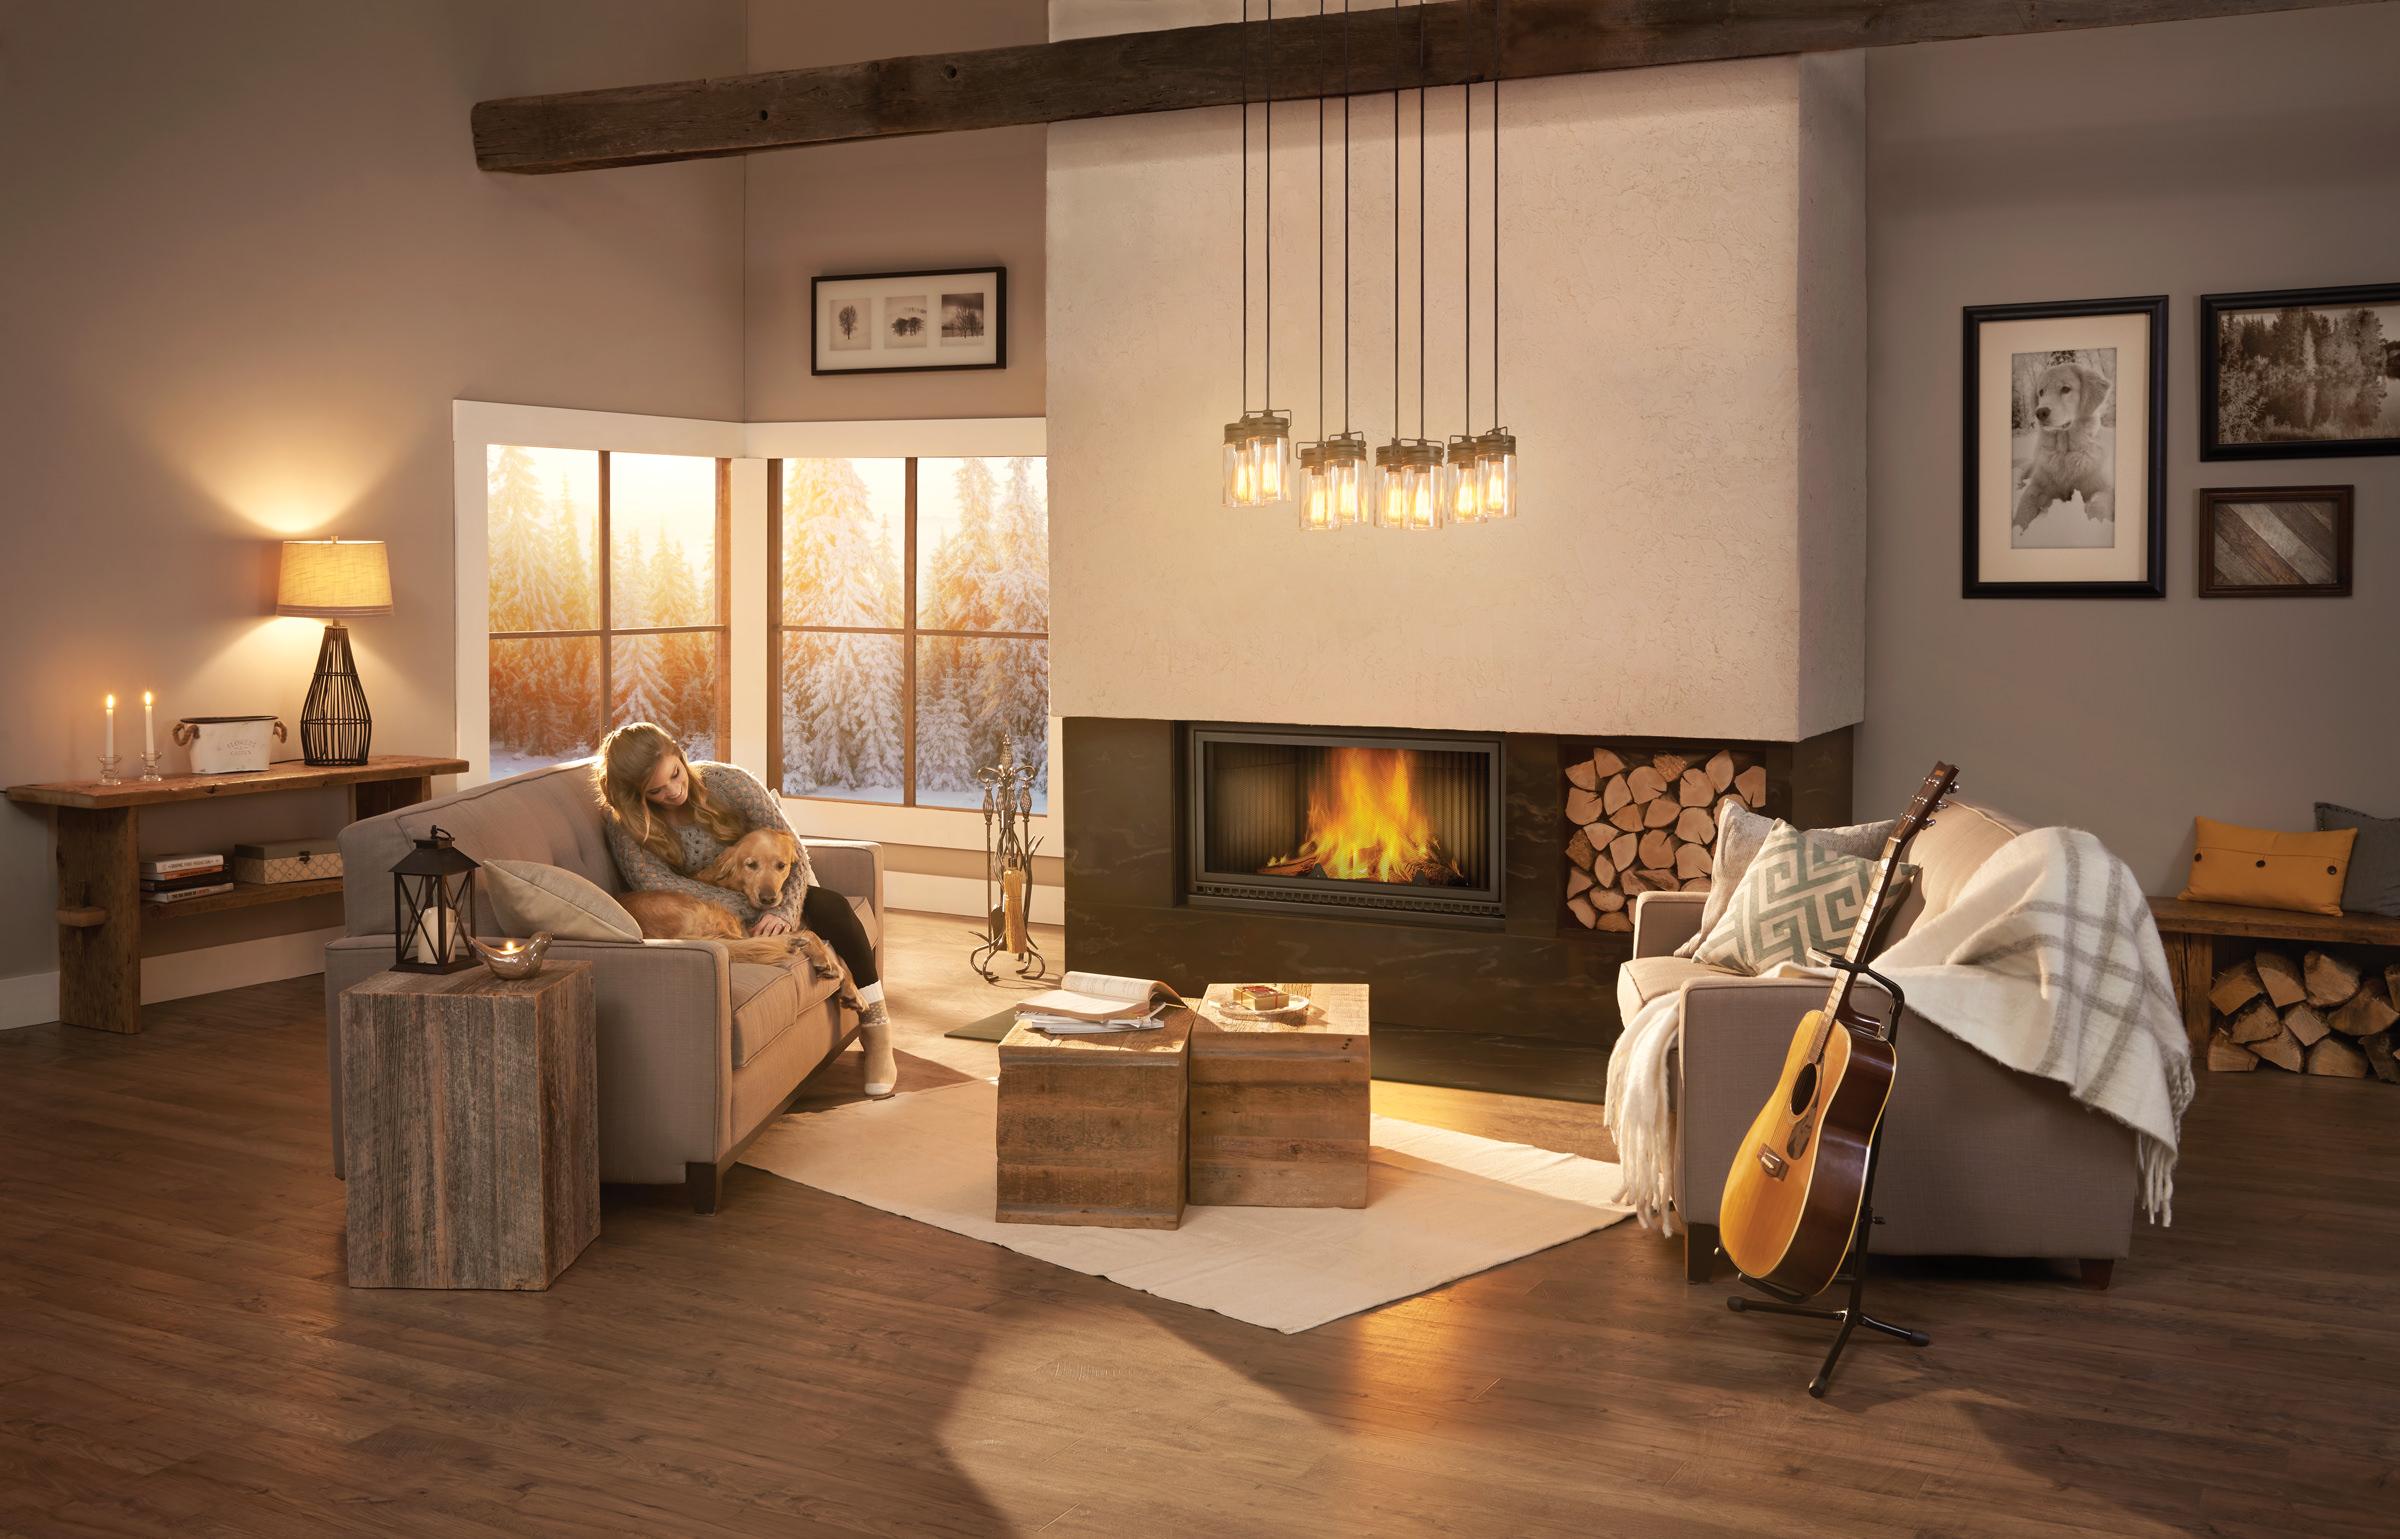 Napoleon U2013 High Country 7000 Wood Fireplace. ; 